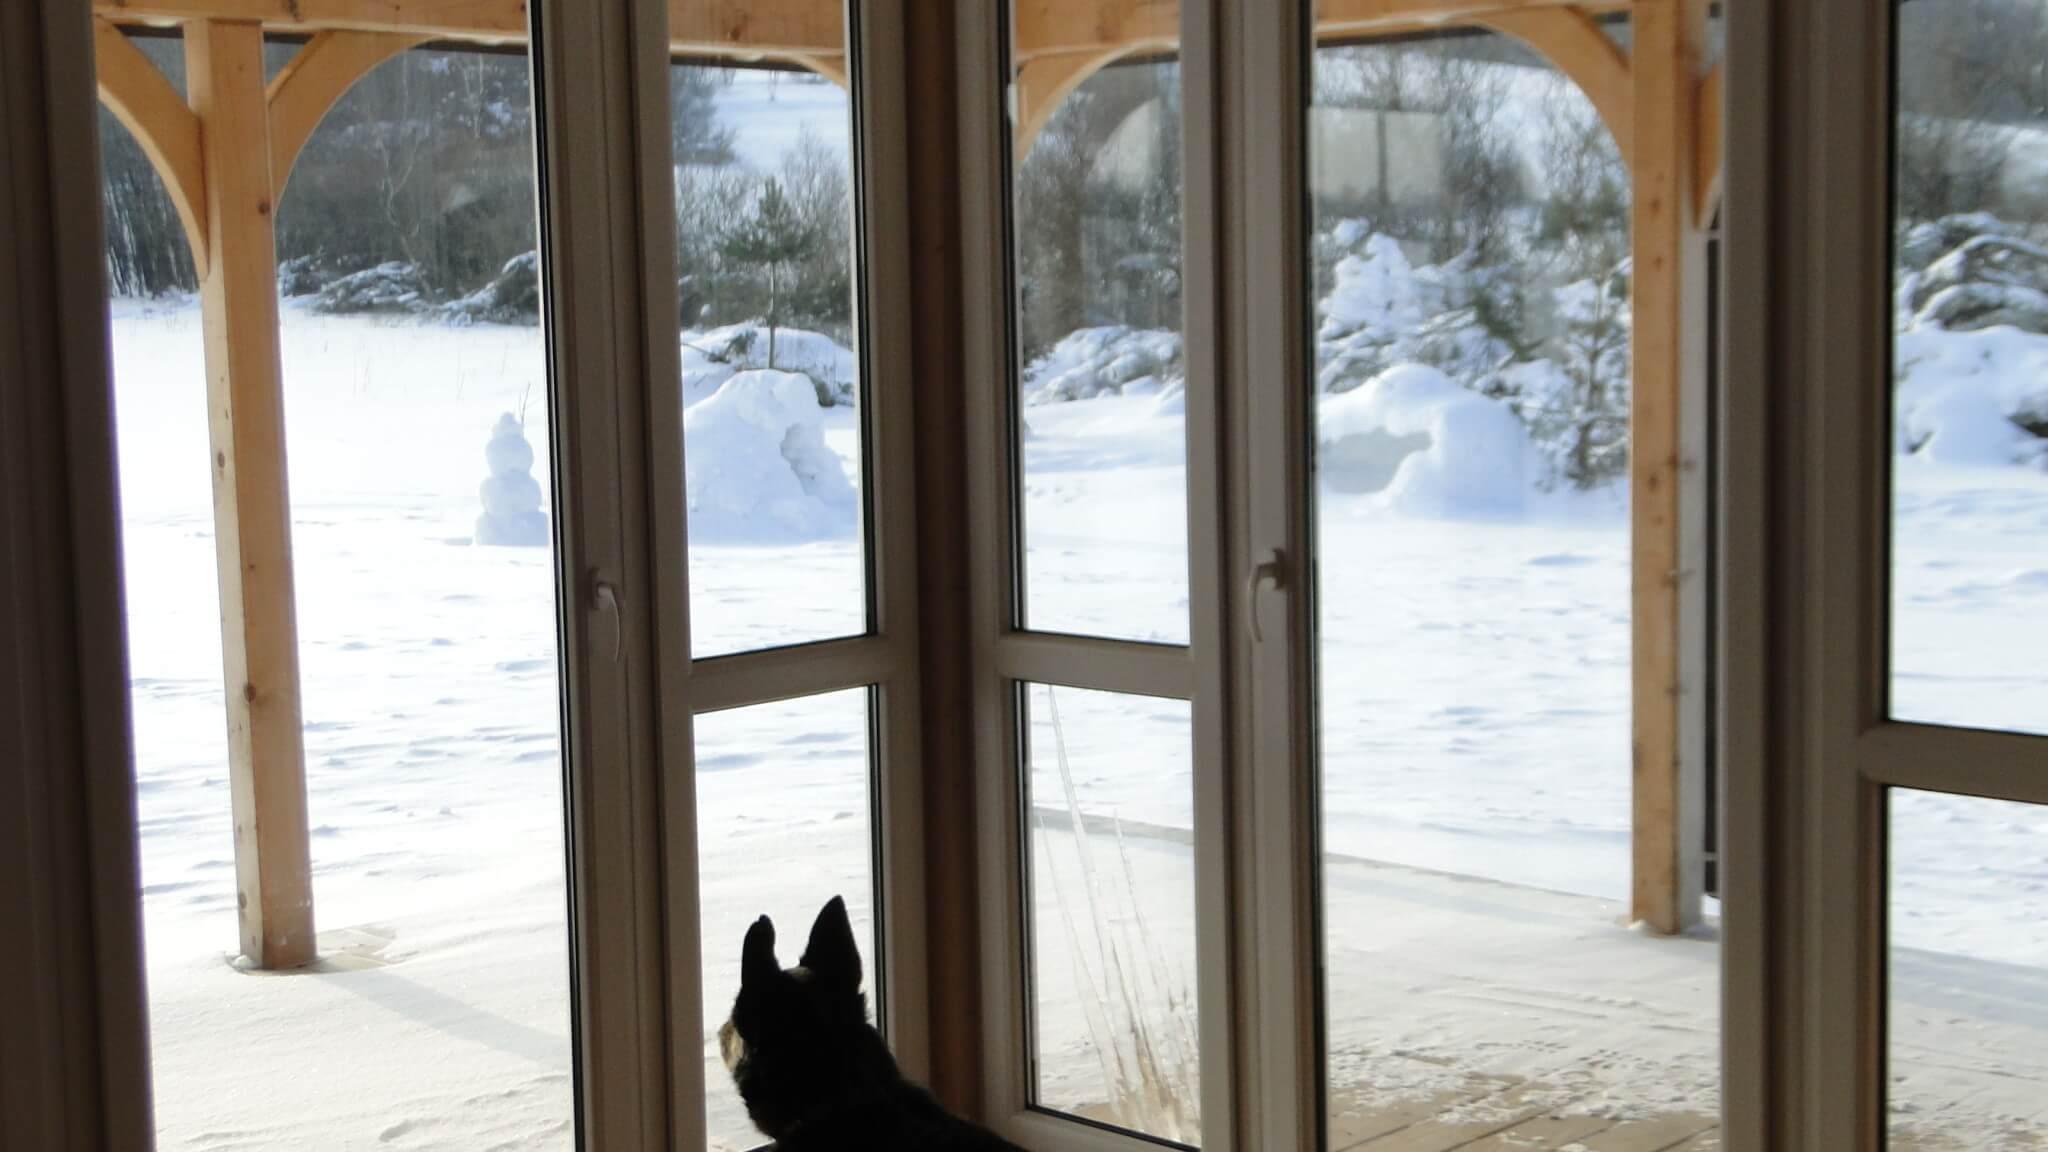 Lutowa zima - śnieżna i mroźna 26